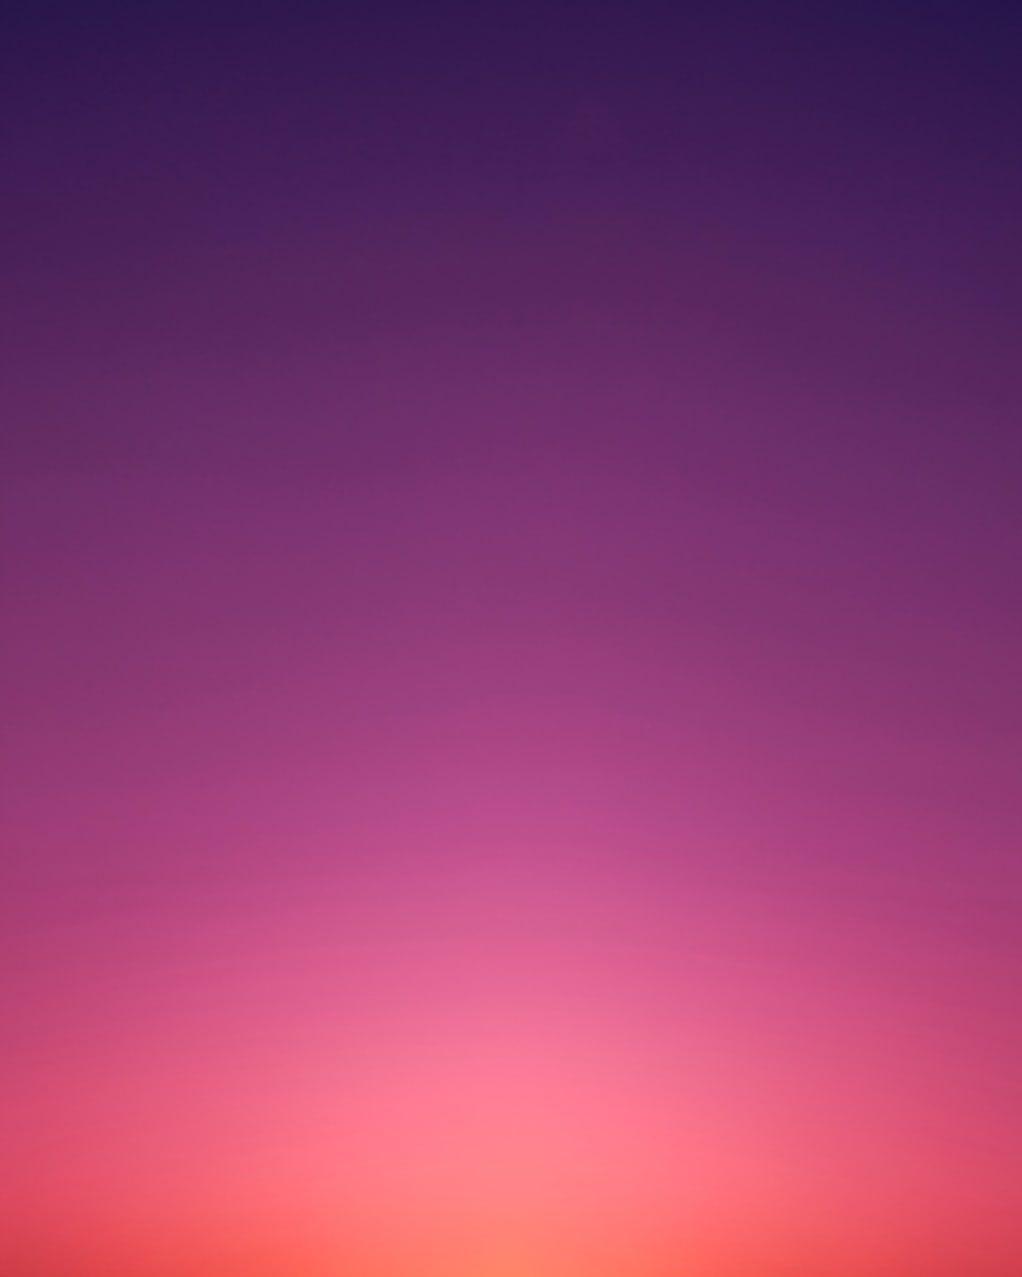 """Sky"" Series By Eric Cahan"